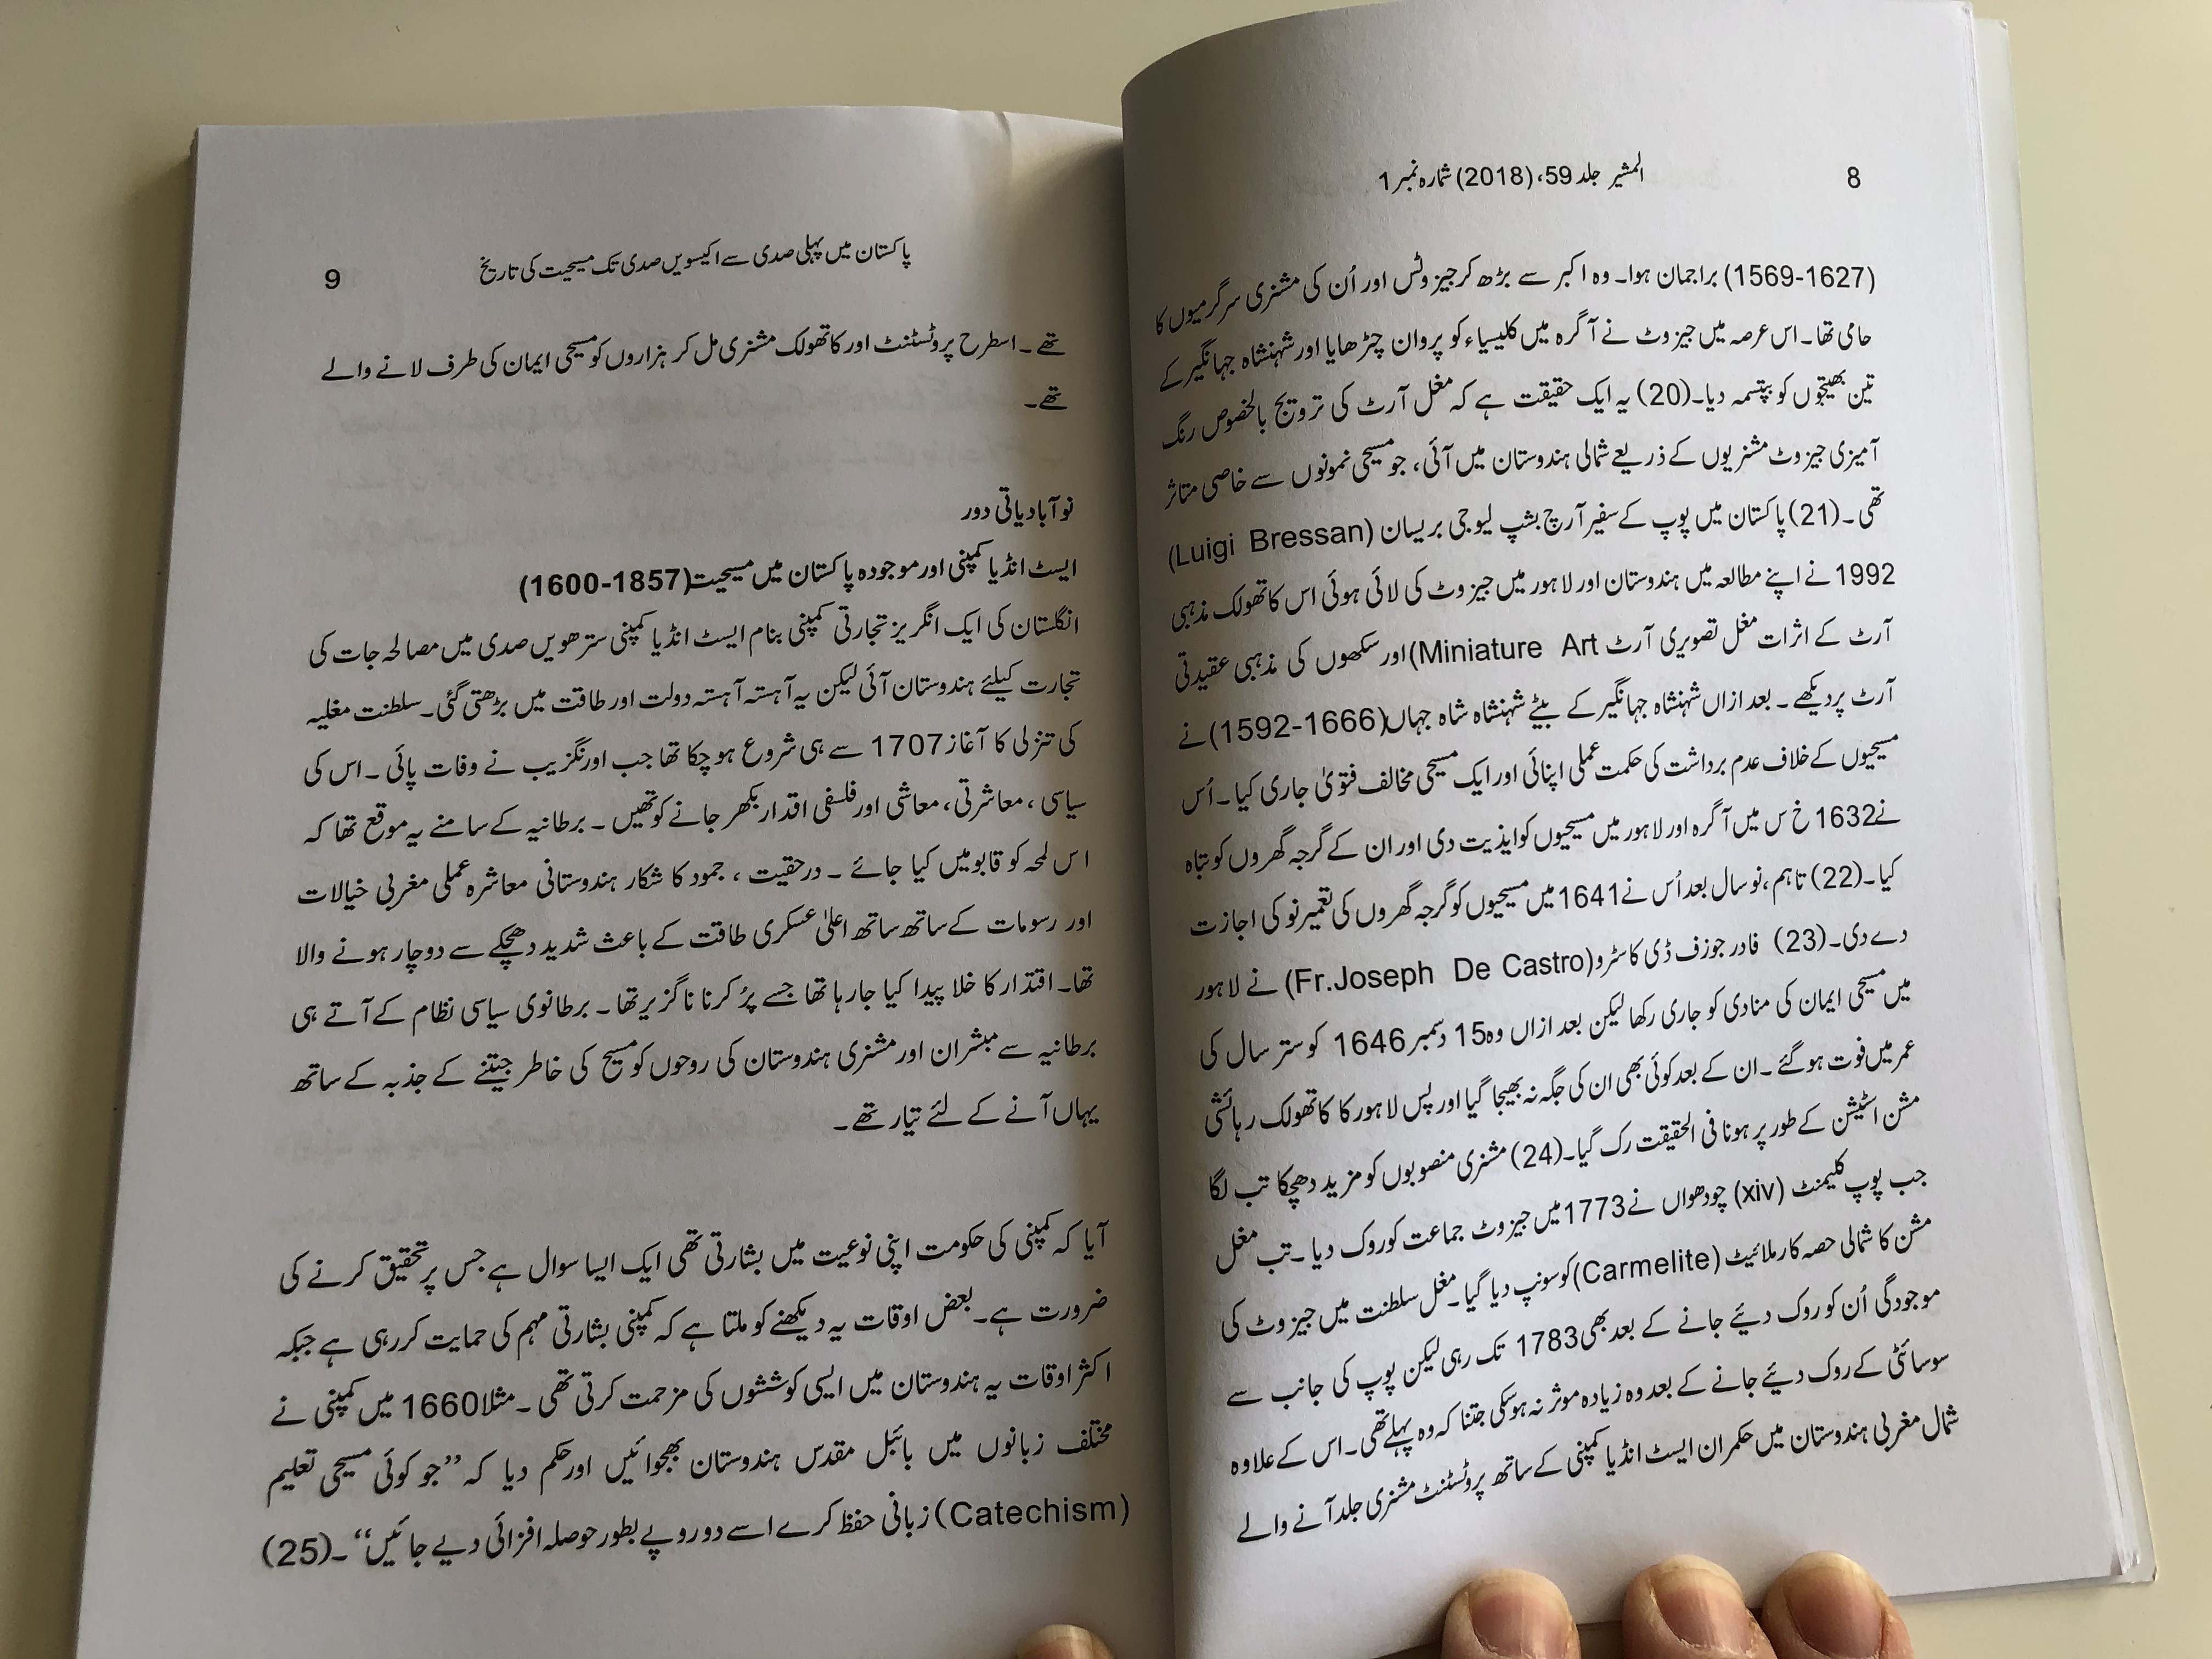 al-mushir-the-counselor-volume-59.-no.-1-11.jpg